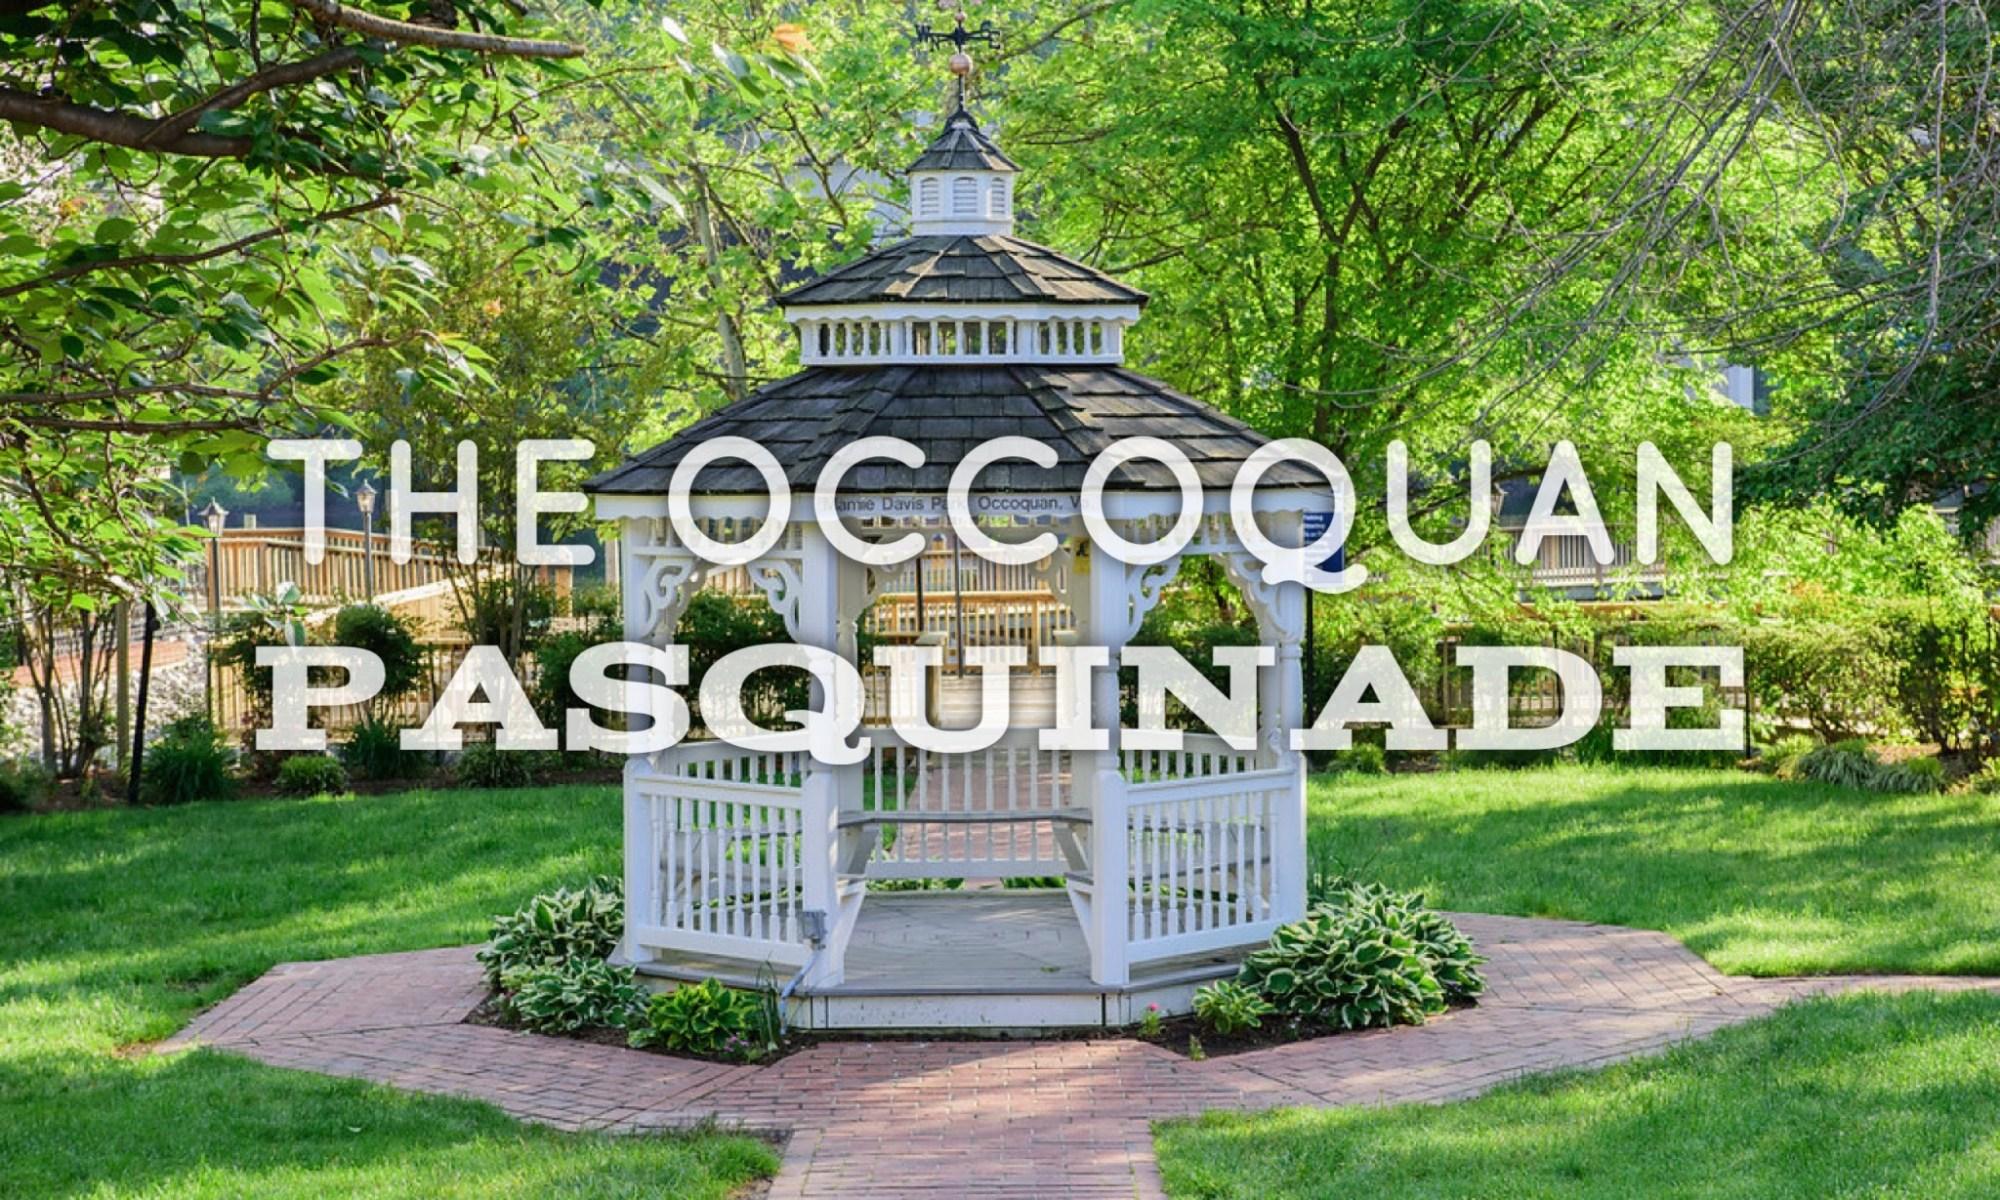 The Occoquan Pasquinade